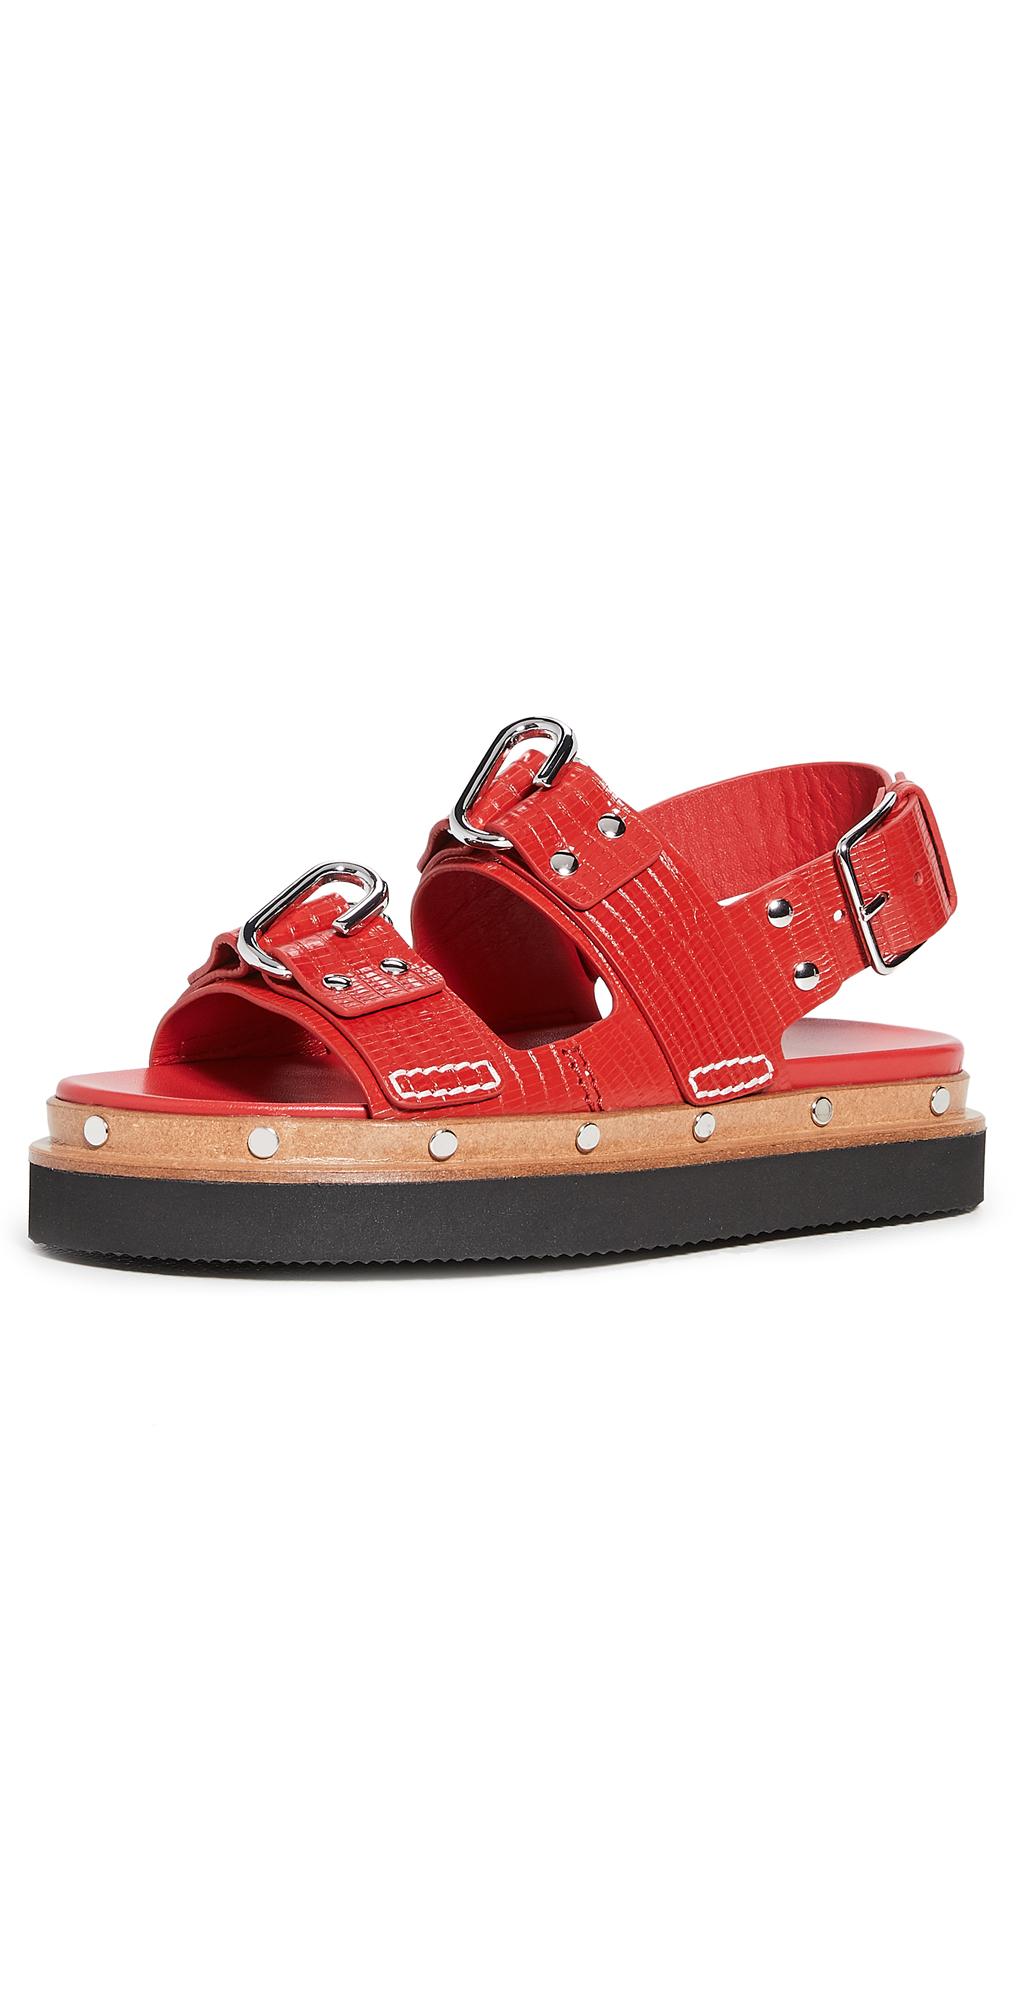 3.1 Phillip Lim Alix Flatform Sandals